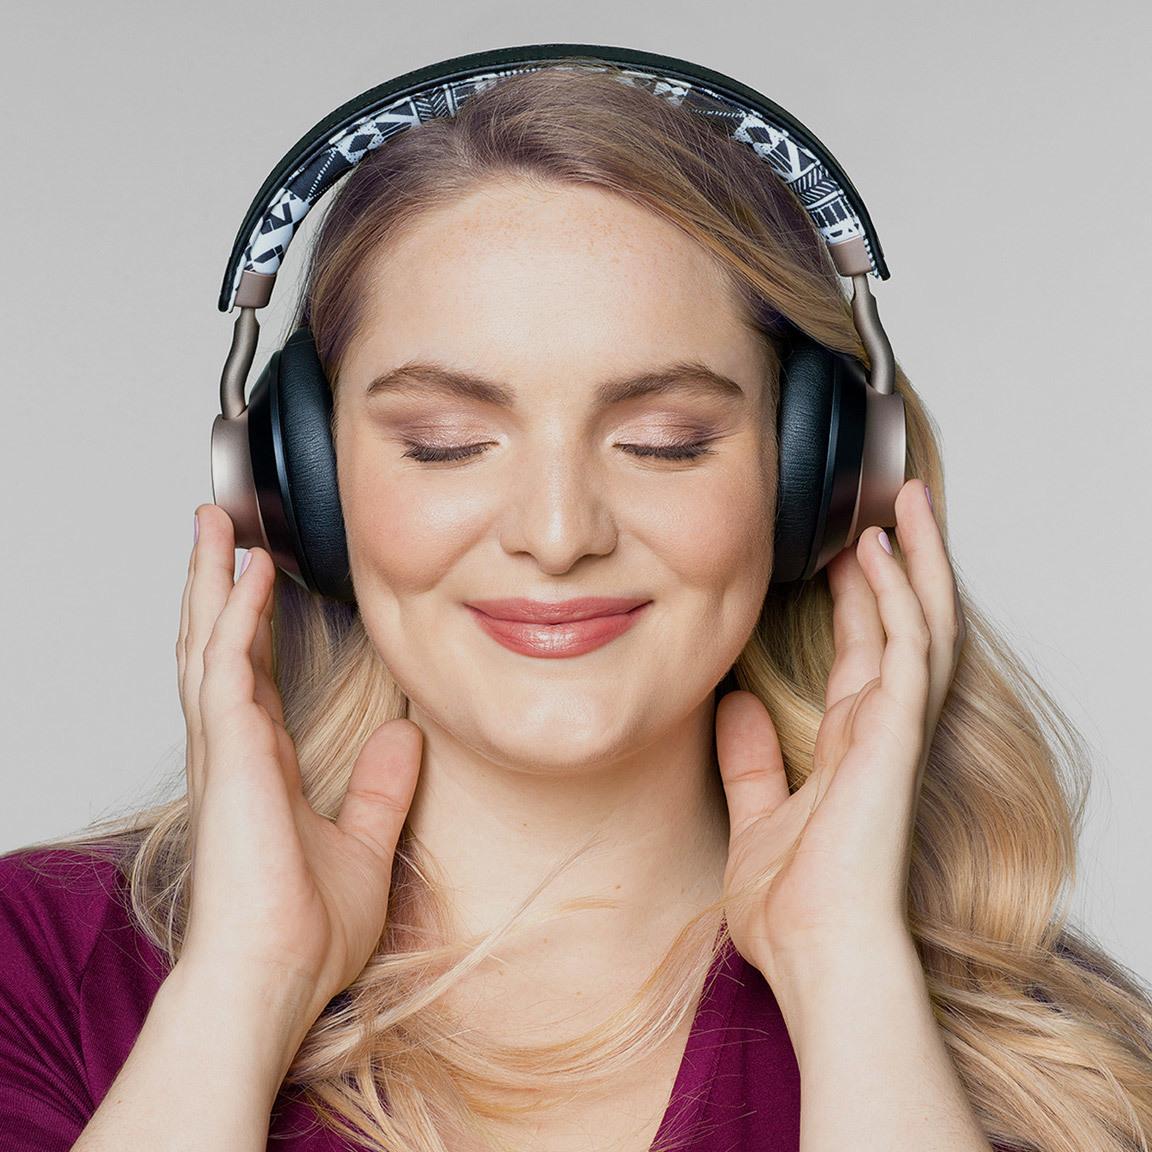 Target Main Image Headphones 1152X1152 V1